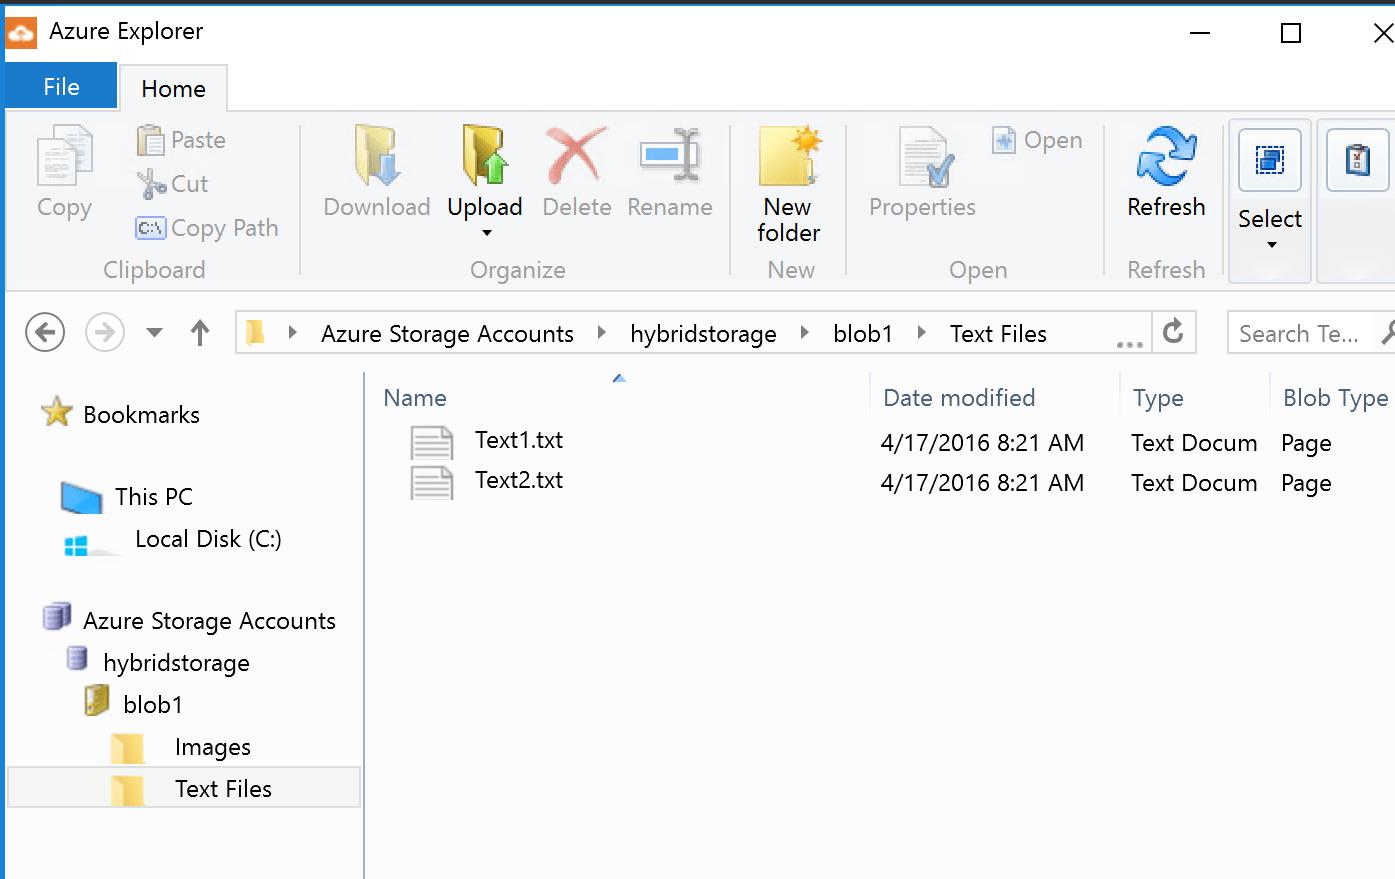 Connect Azure Explorer to Azure Stack Storage | Buchatech com